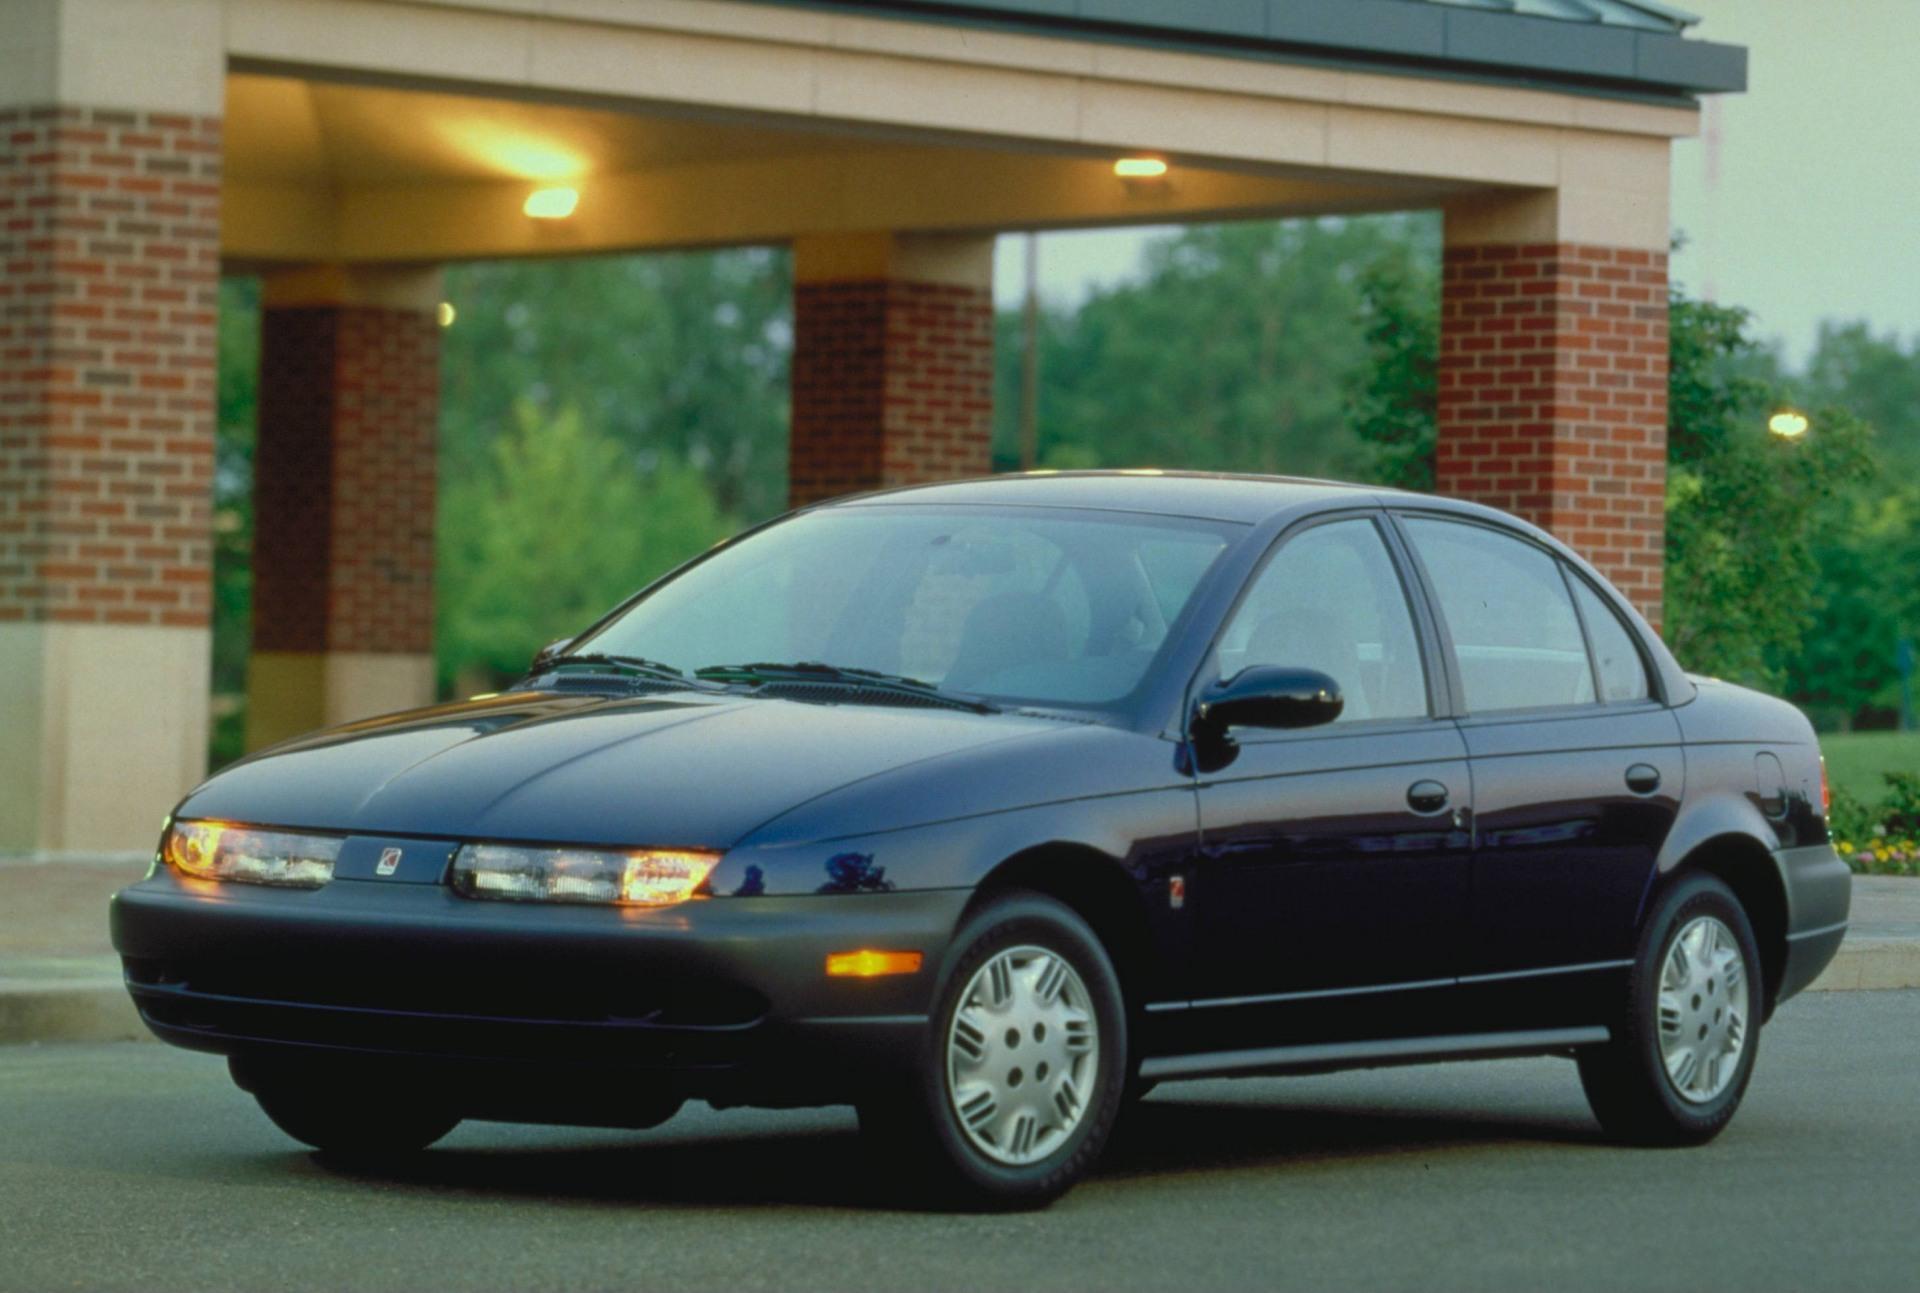 2001 Saturn S Series Image